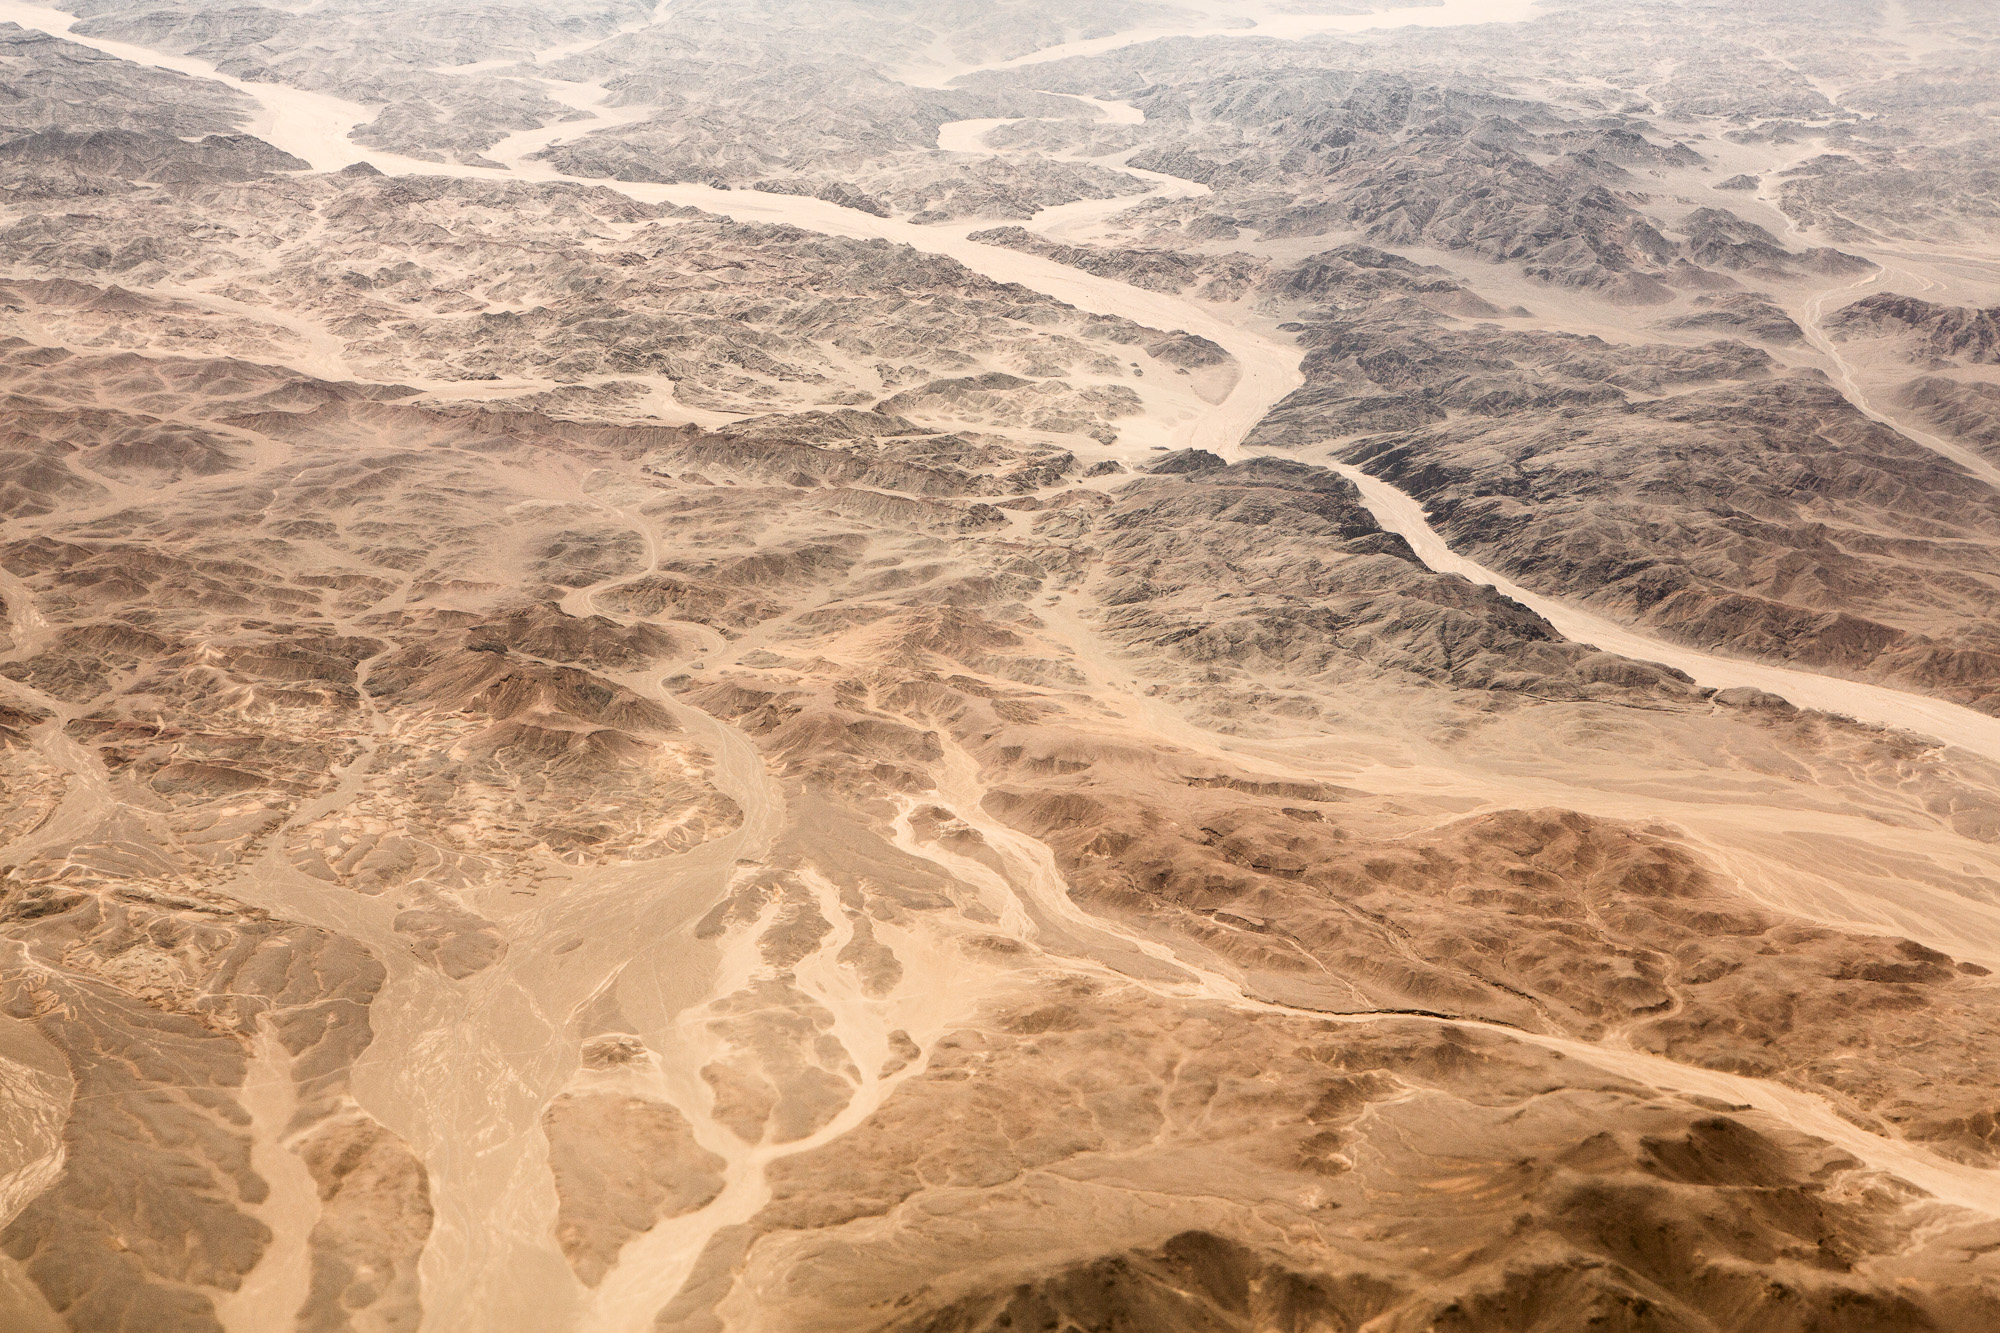 Deserts - Survey #6, 2015